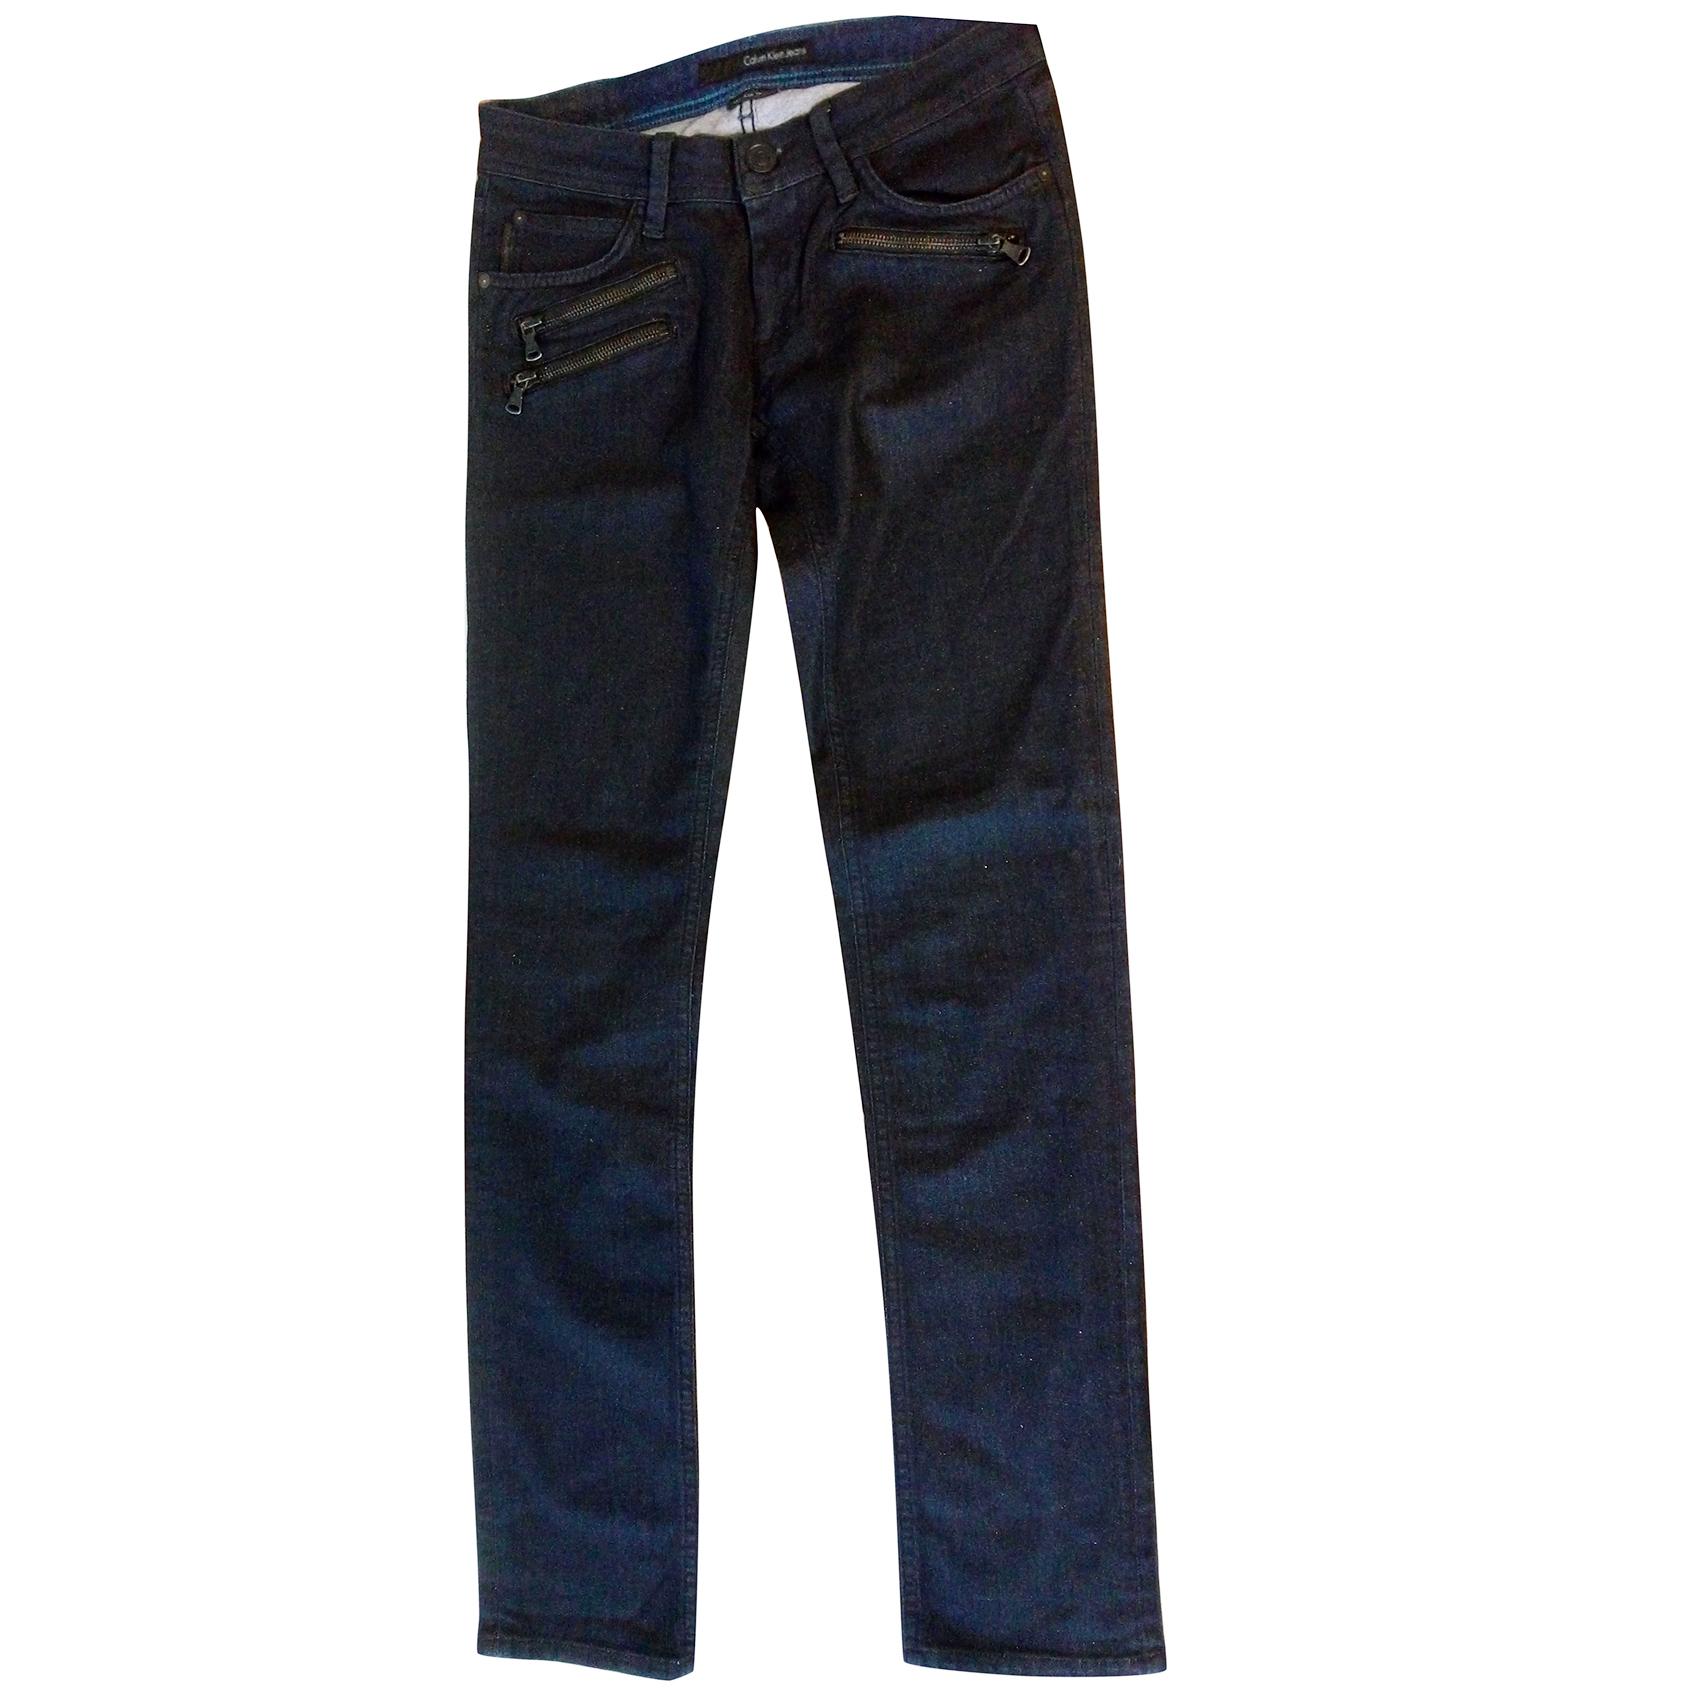 Calvin Klein Low rise skinny jeans